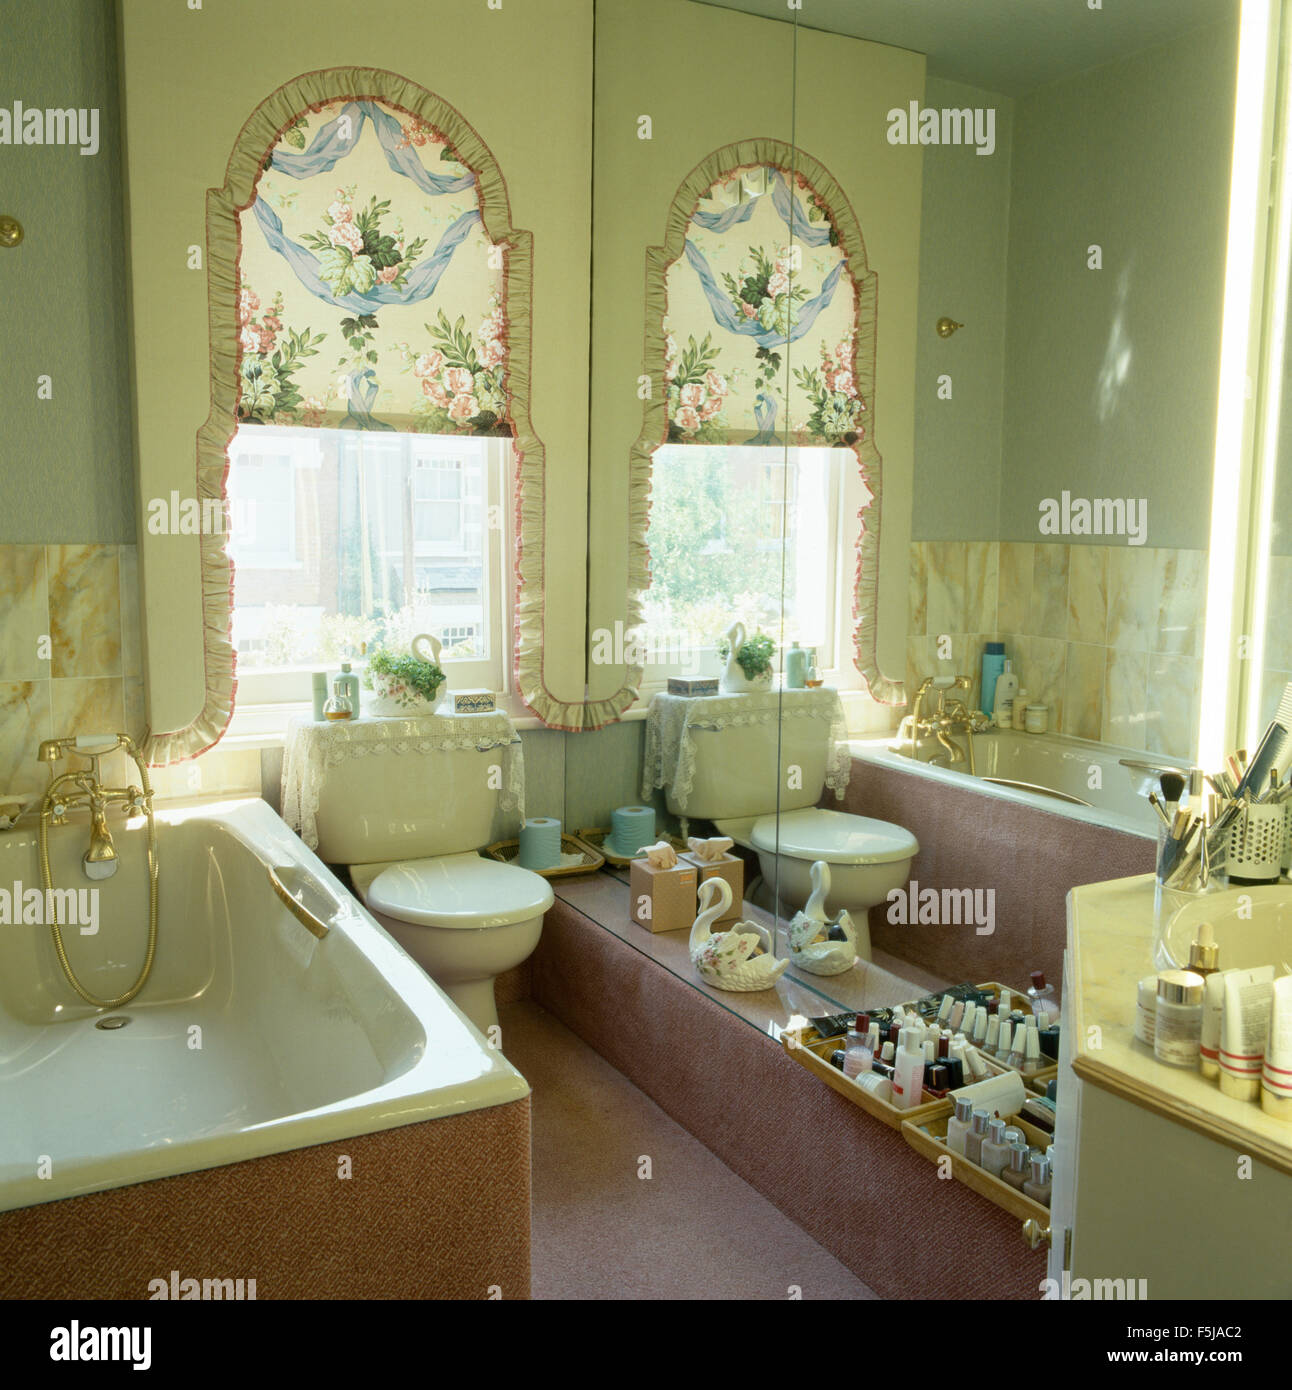 Grünes Badezimmer Stockfotos & Grünes Badezimmer Bilder - Alamy